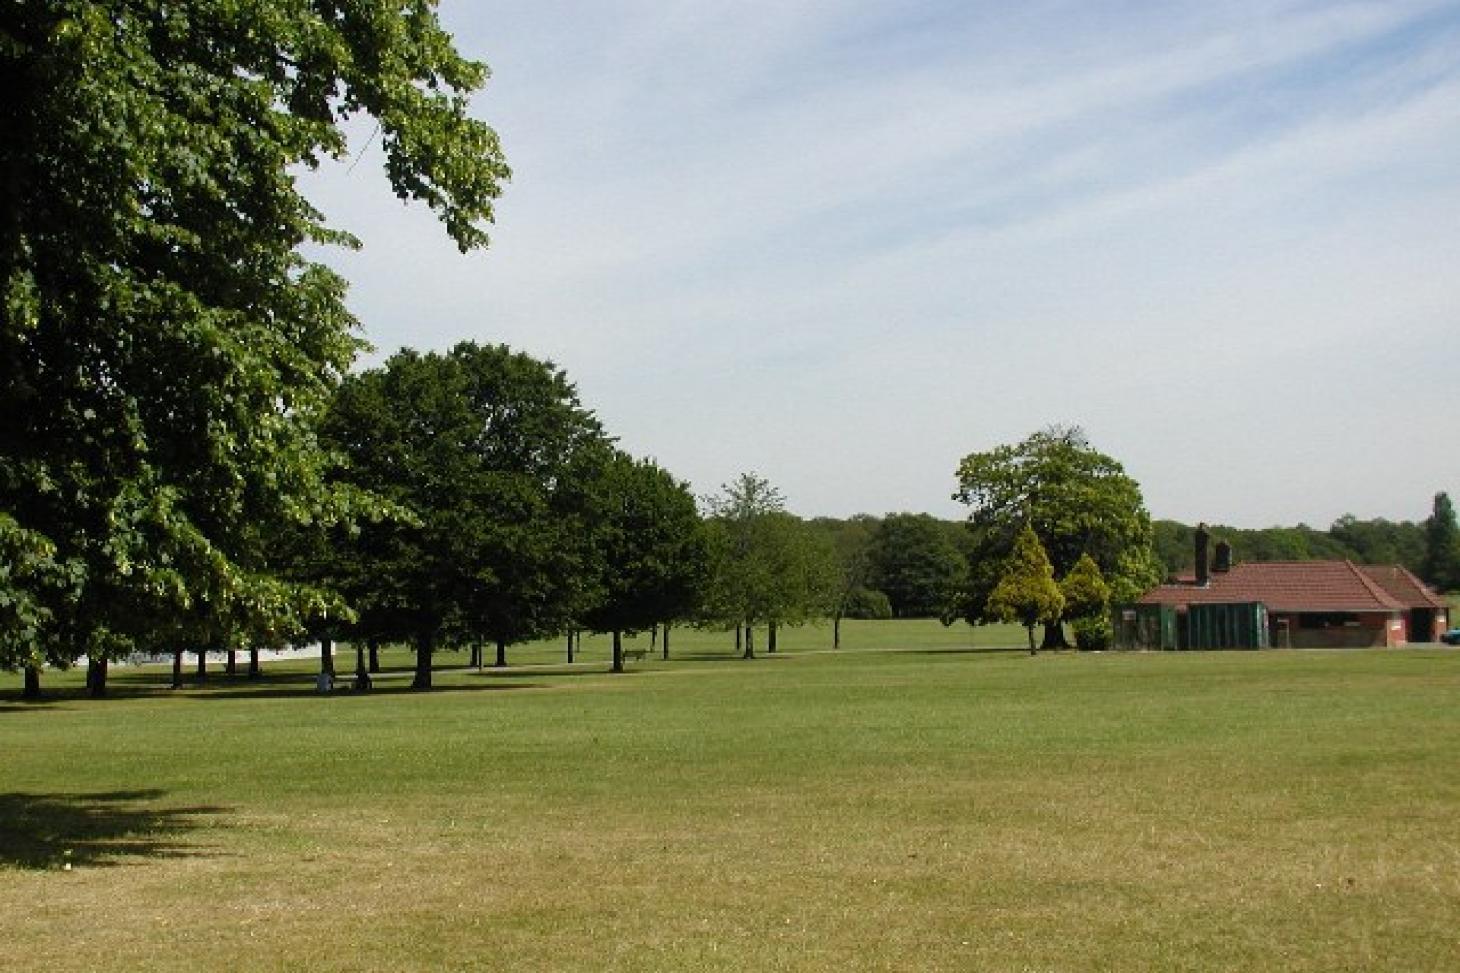 Eltham Park 11 a side | Grass football pitch